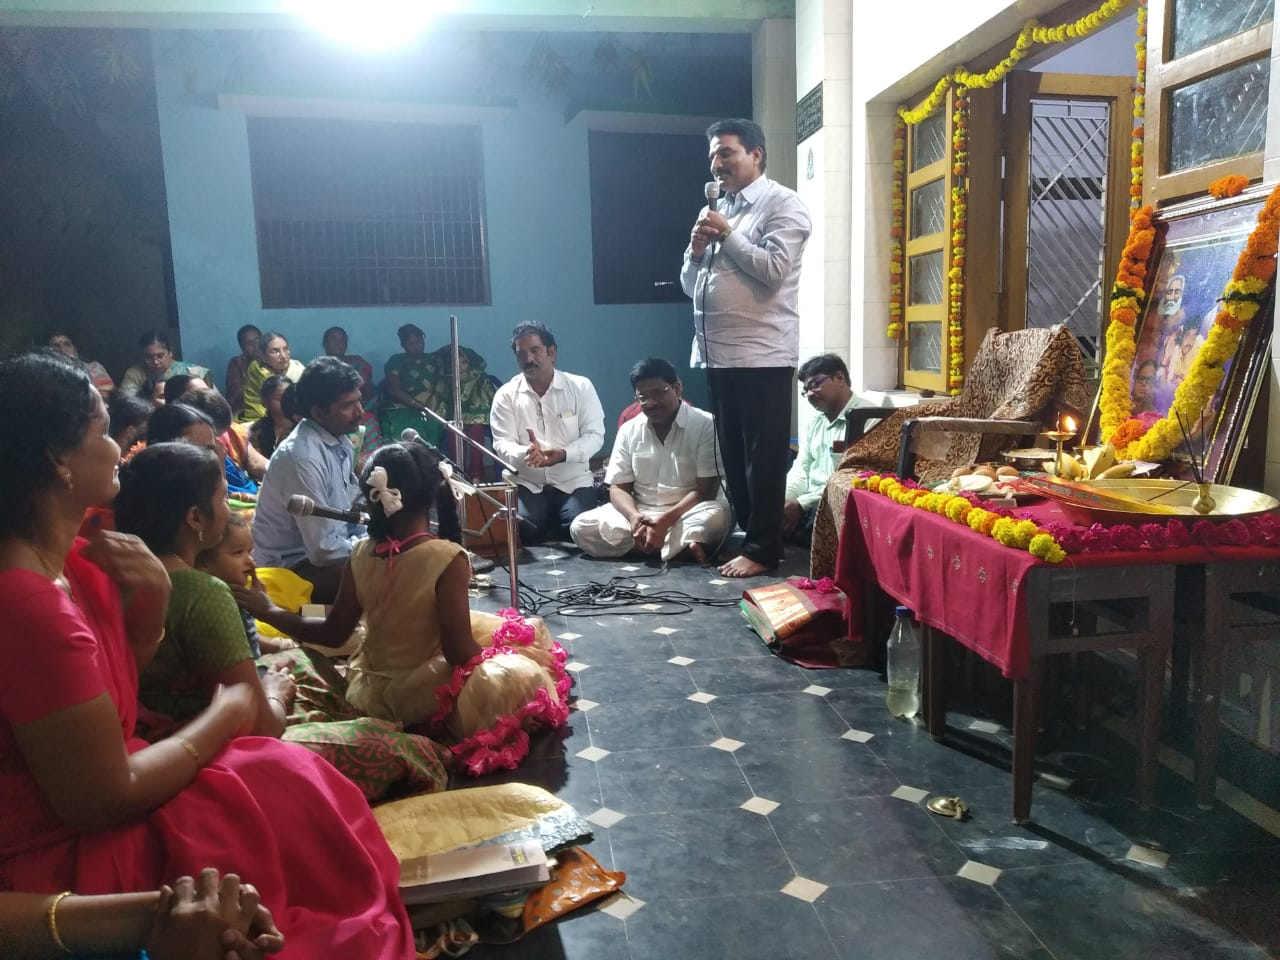 03-KarthikaMasam-Aaradhana-Aacchampeta-27112019